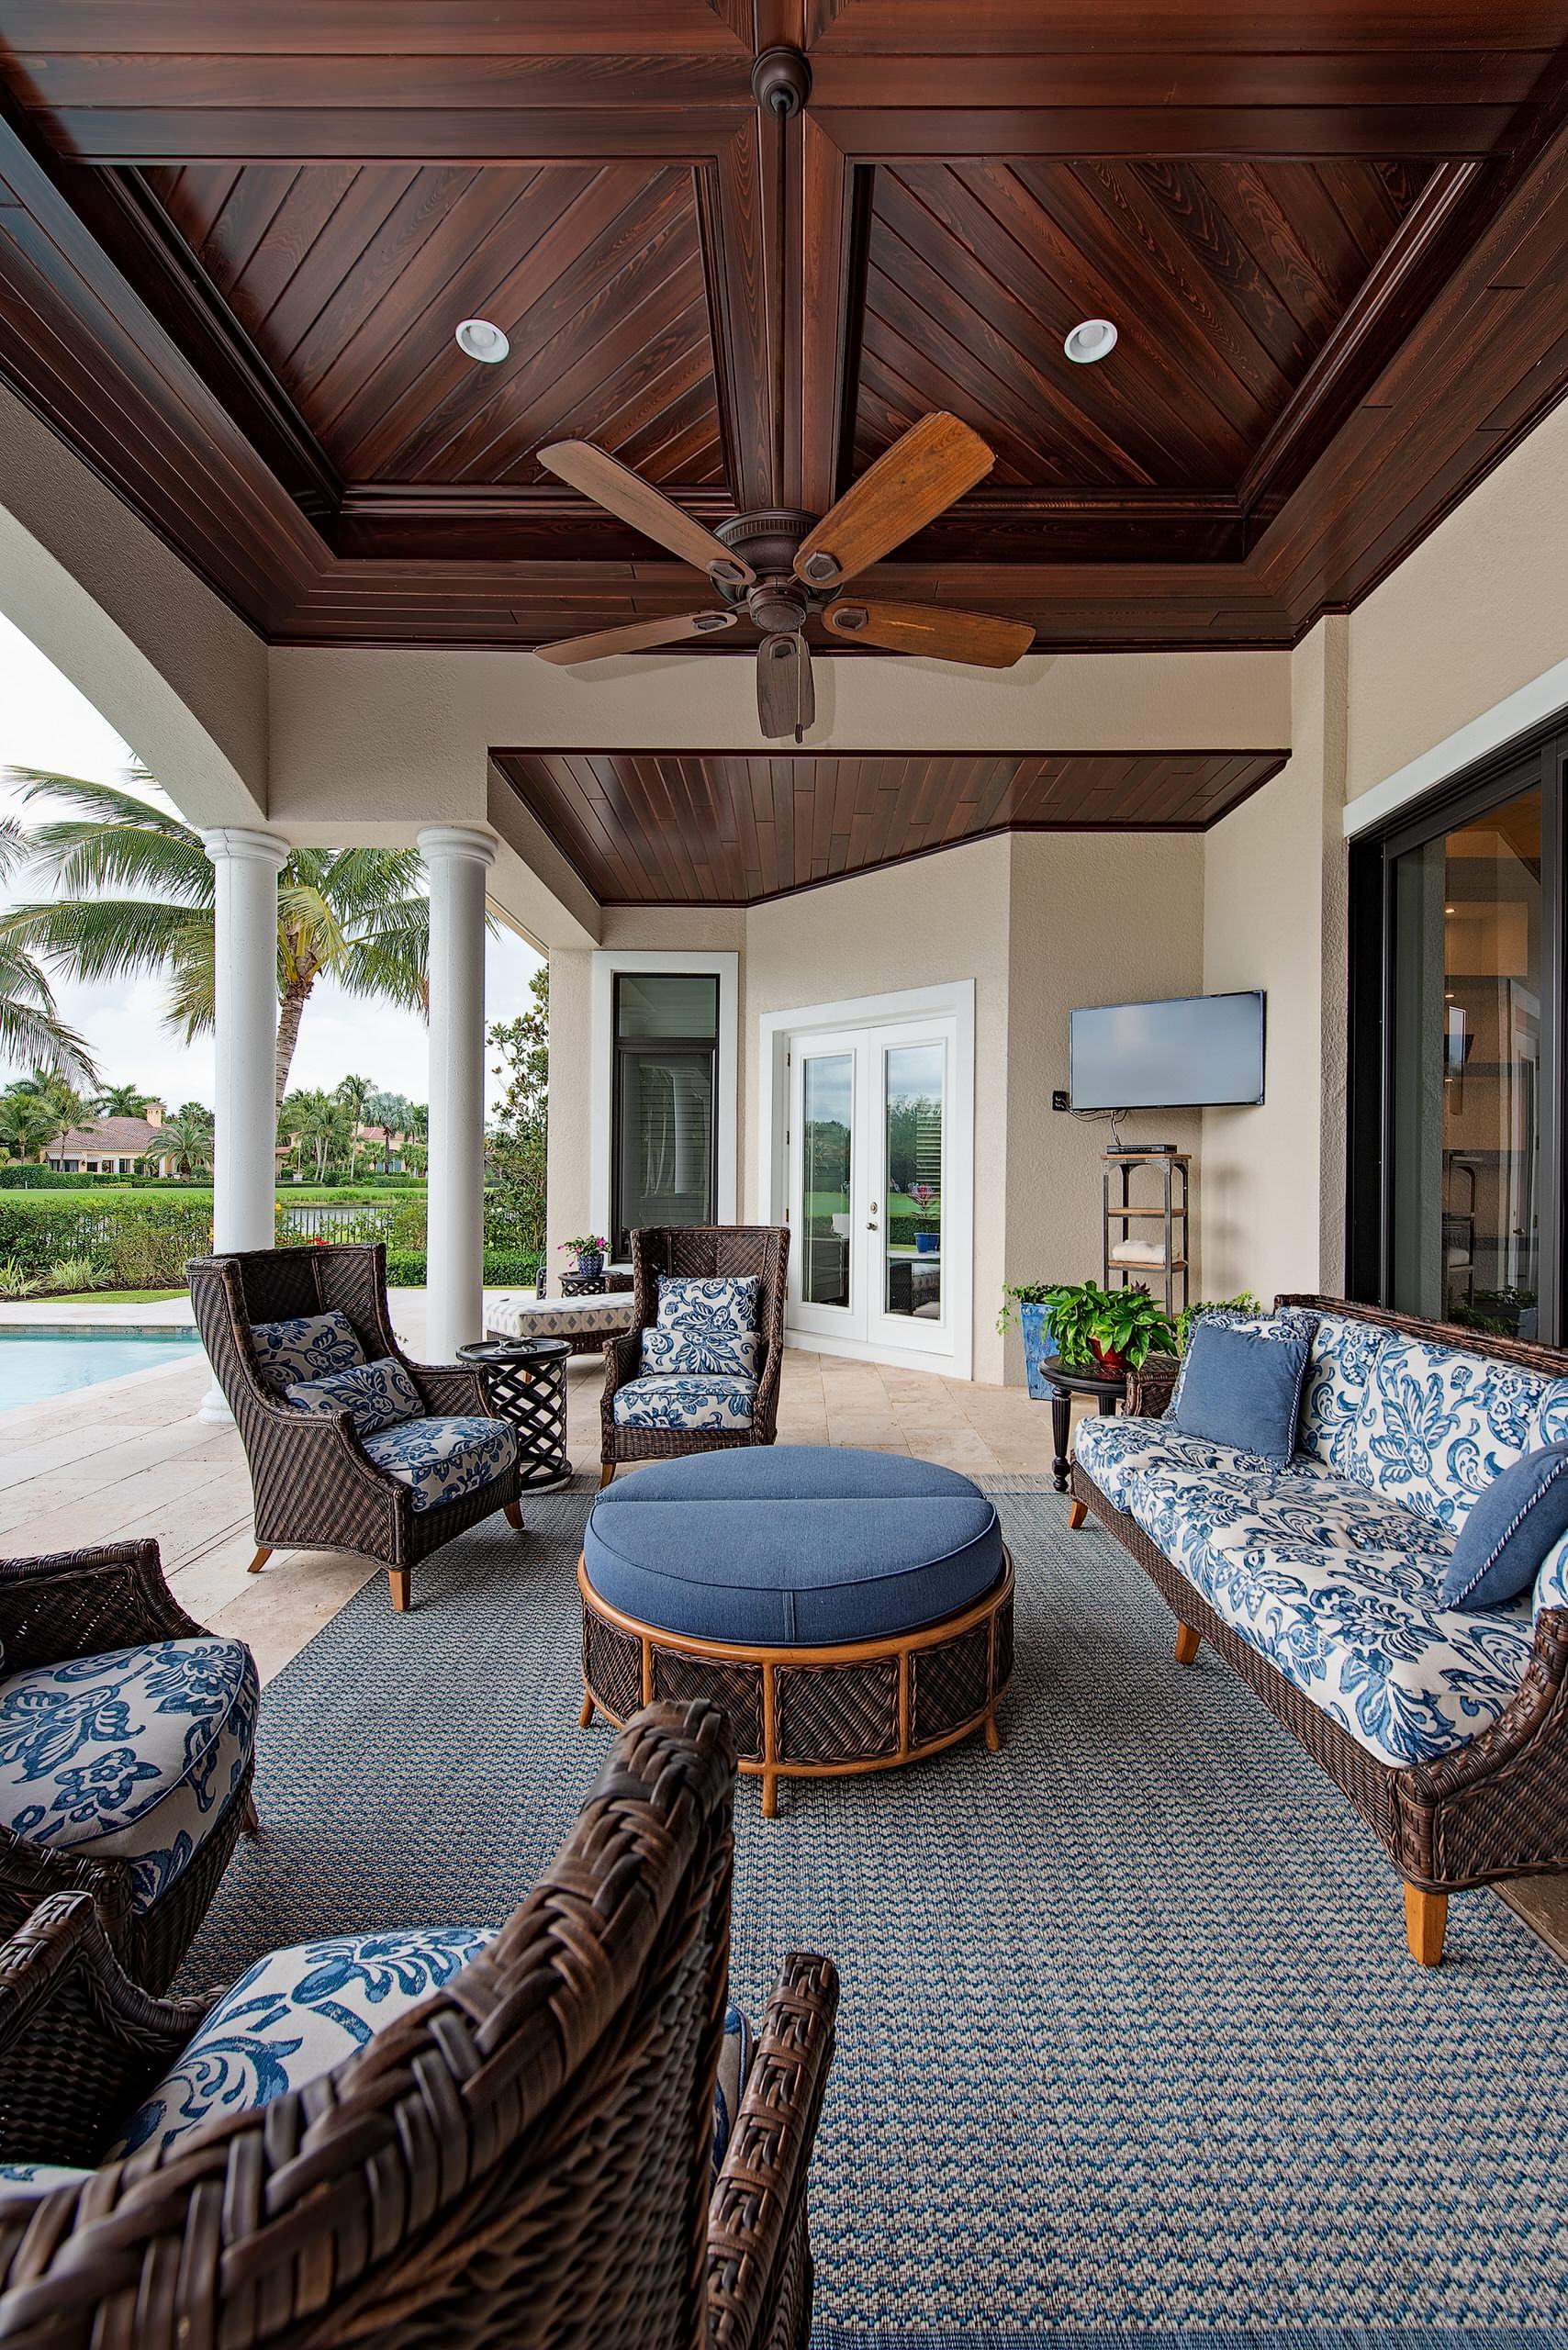 Certified Luxury Builders-41 West-Naples,FL-Quail Remodel 2A